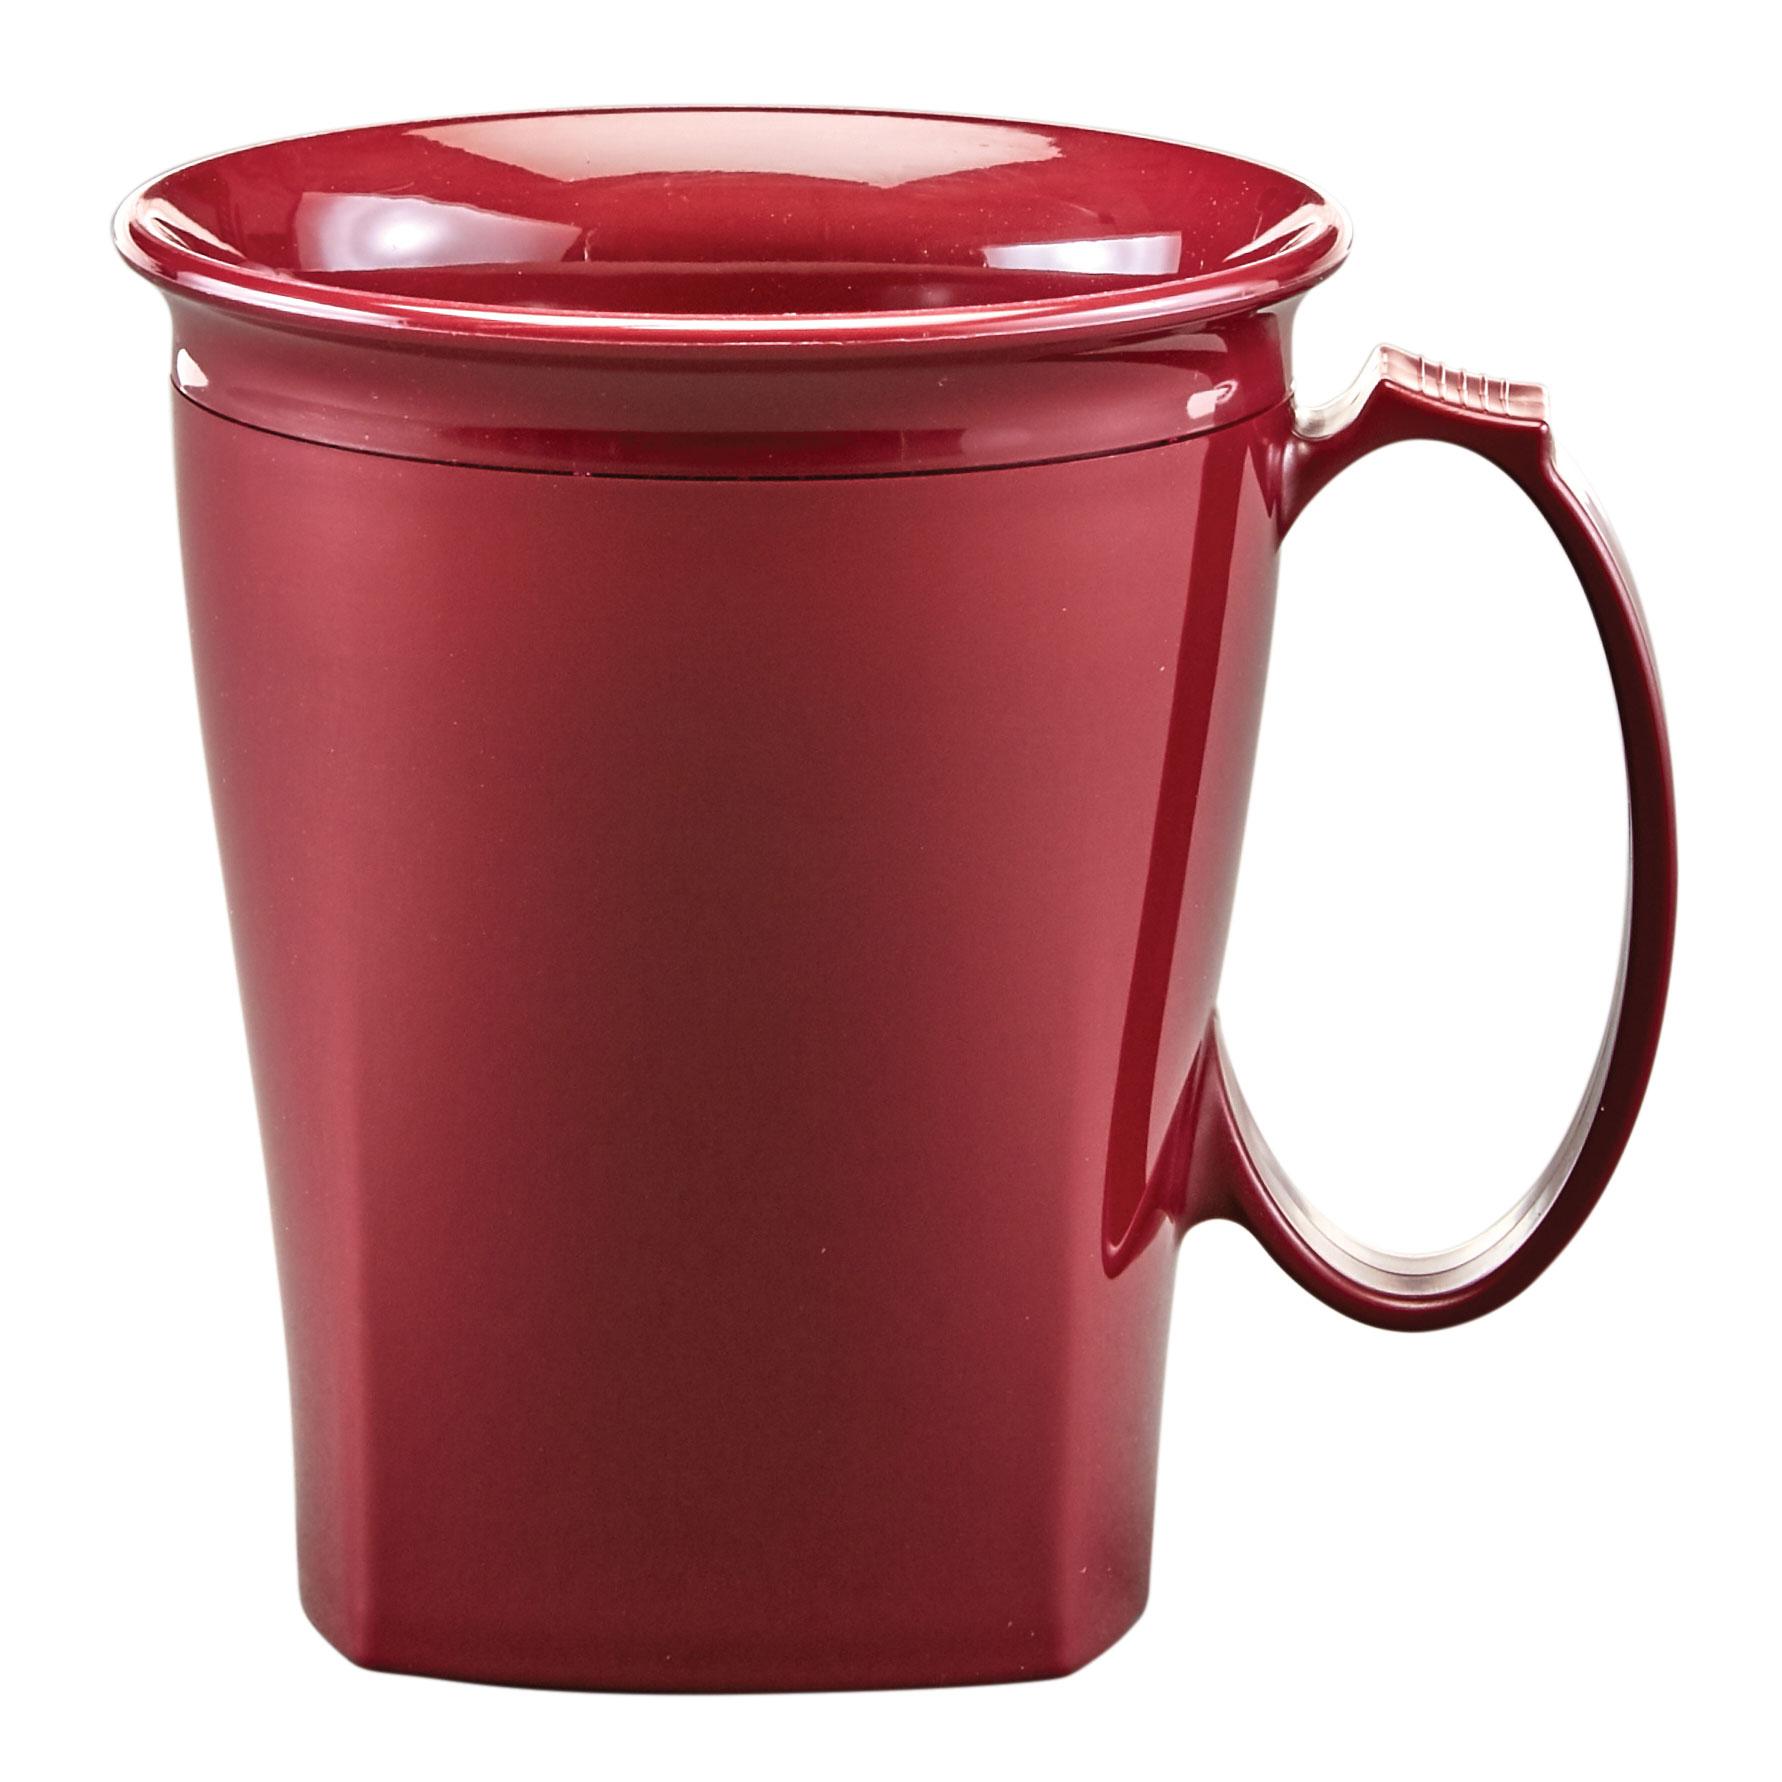 Cambro MDSHM8487 mugs/cups (non disposable)